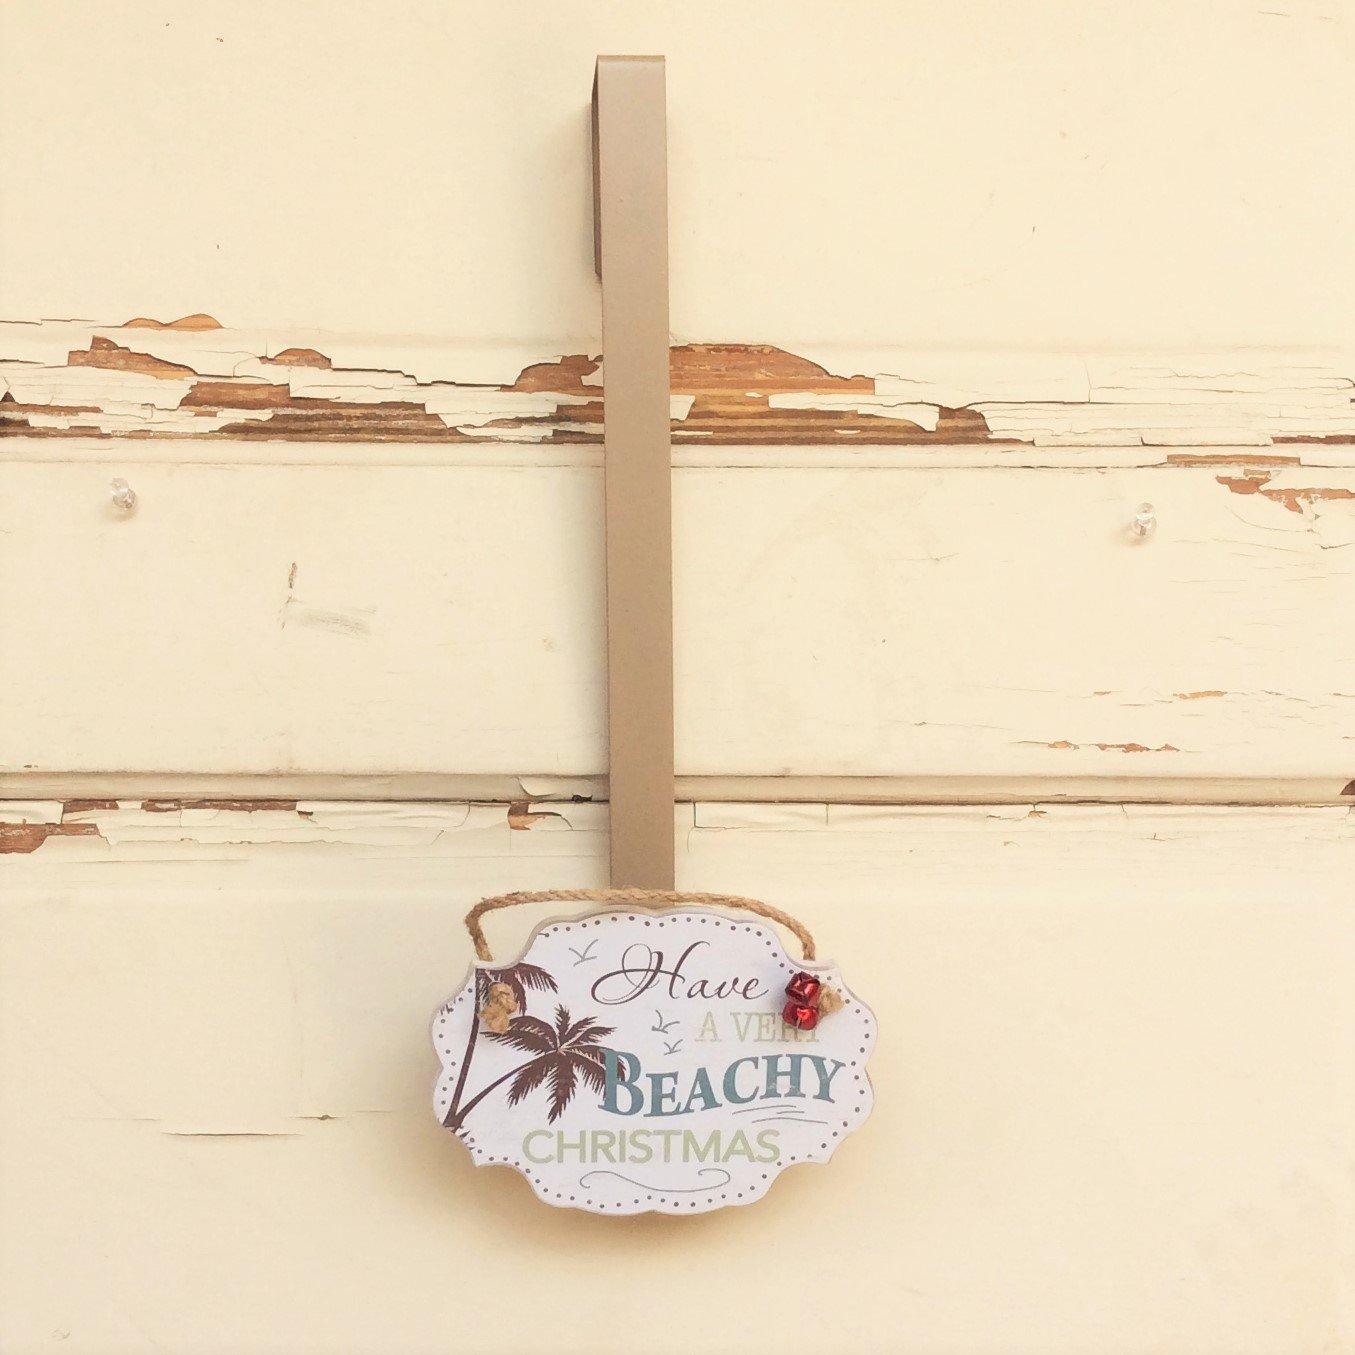 AG Designs Christmas Decor - Wreath Door Hanger - Beachy Christmas